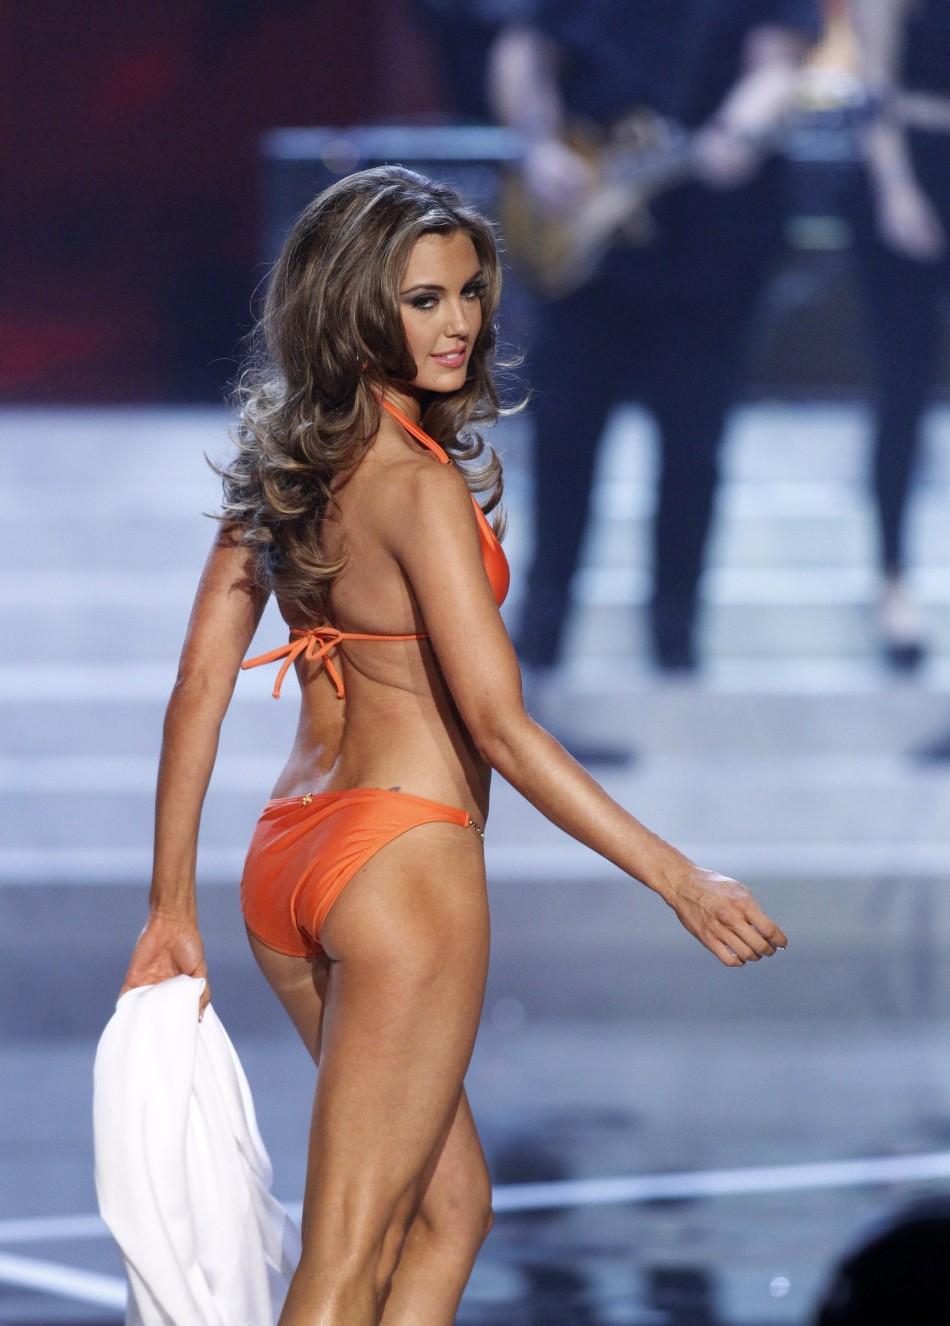 Erin Brady Miss USA 2013 HD Wallpapers